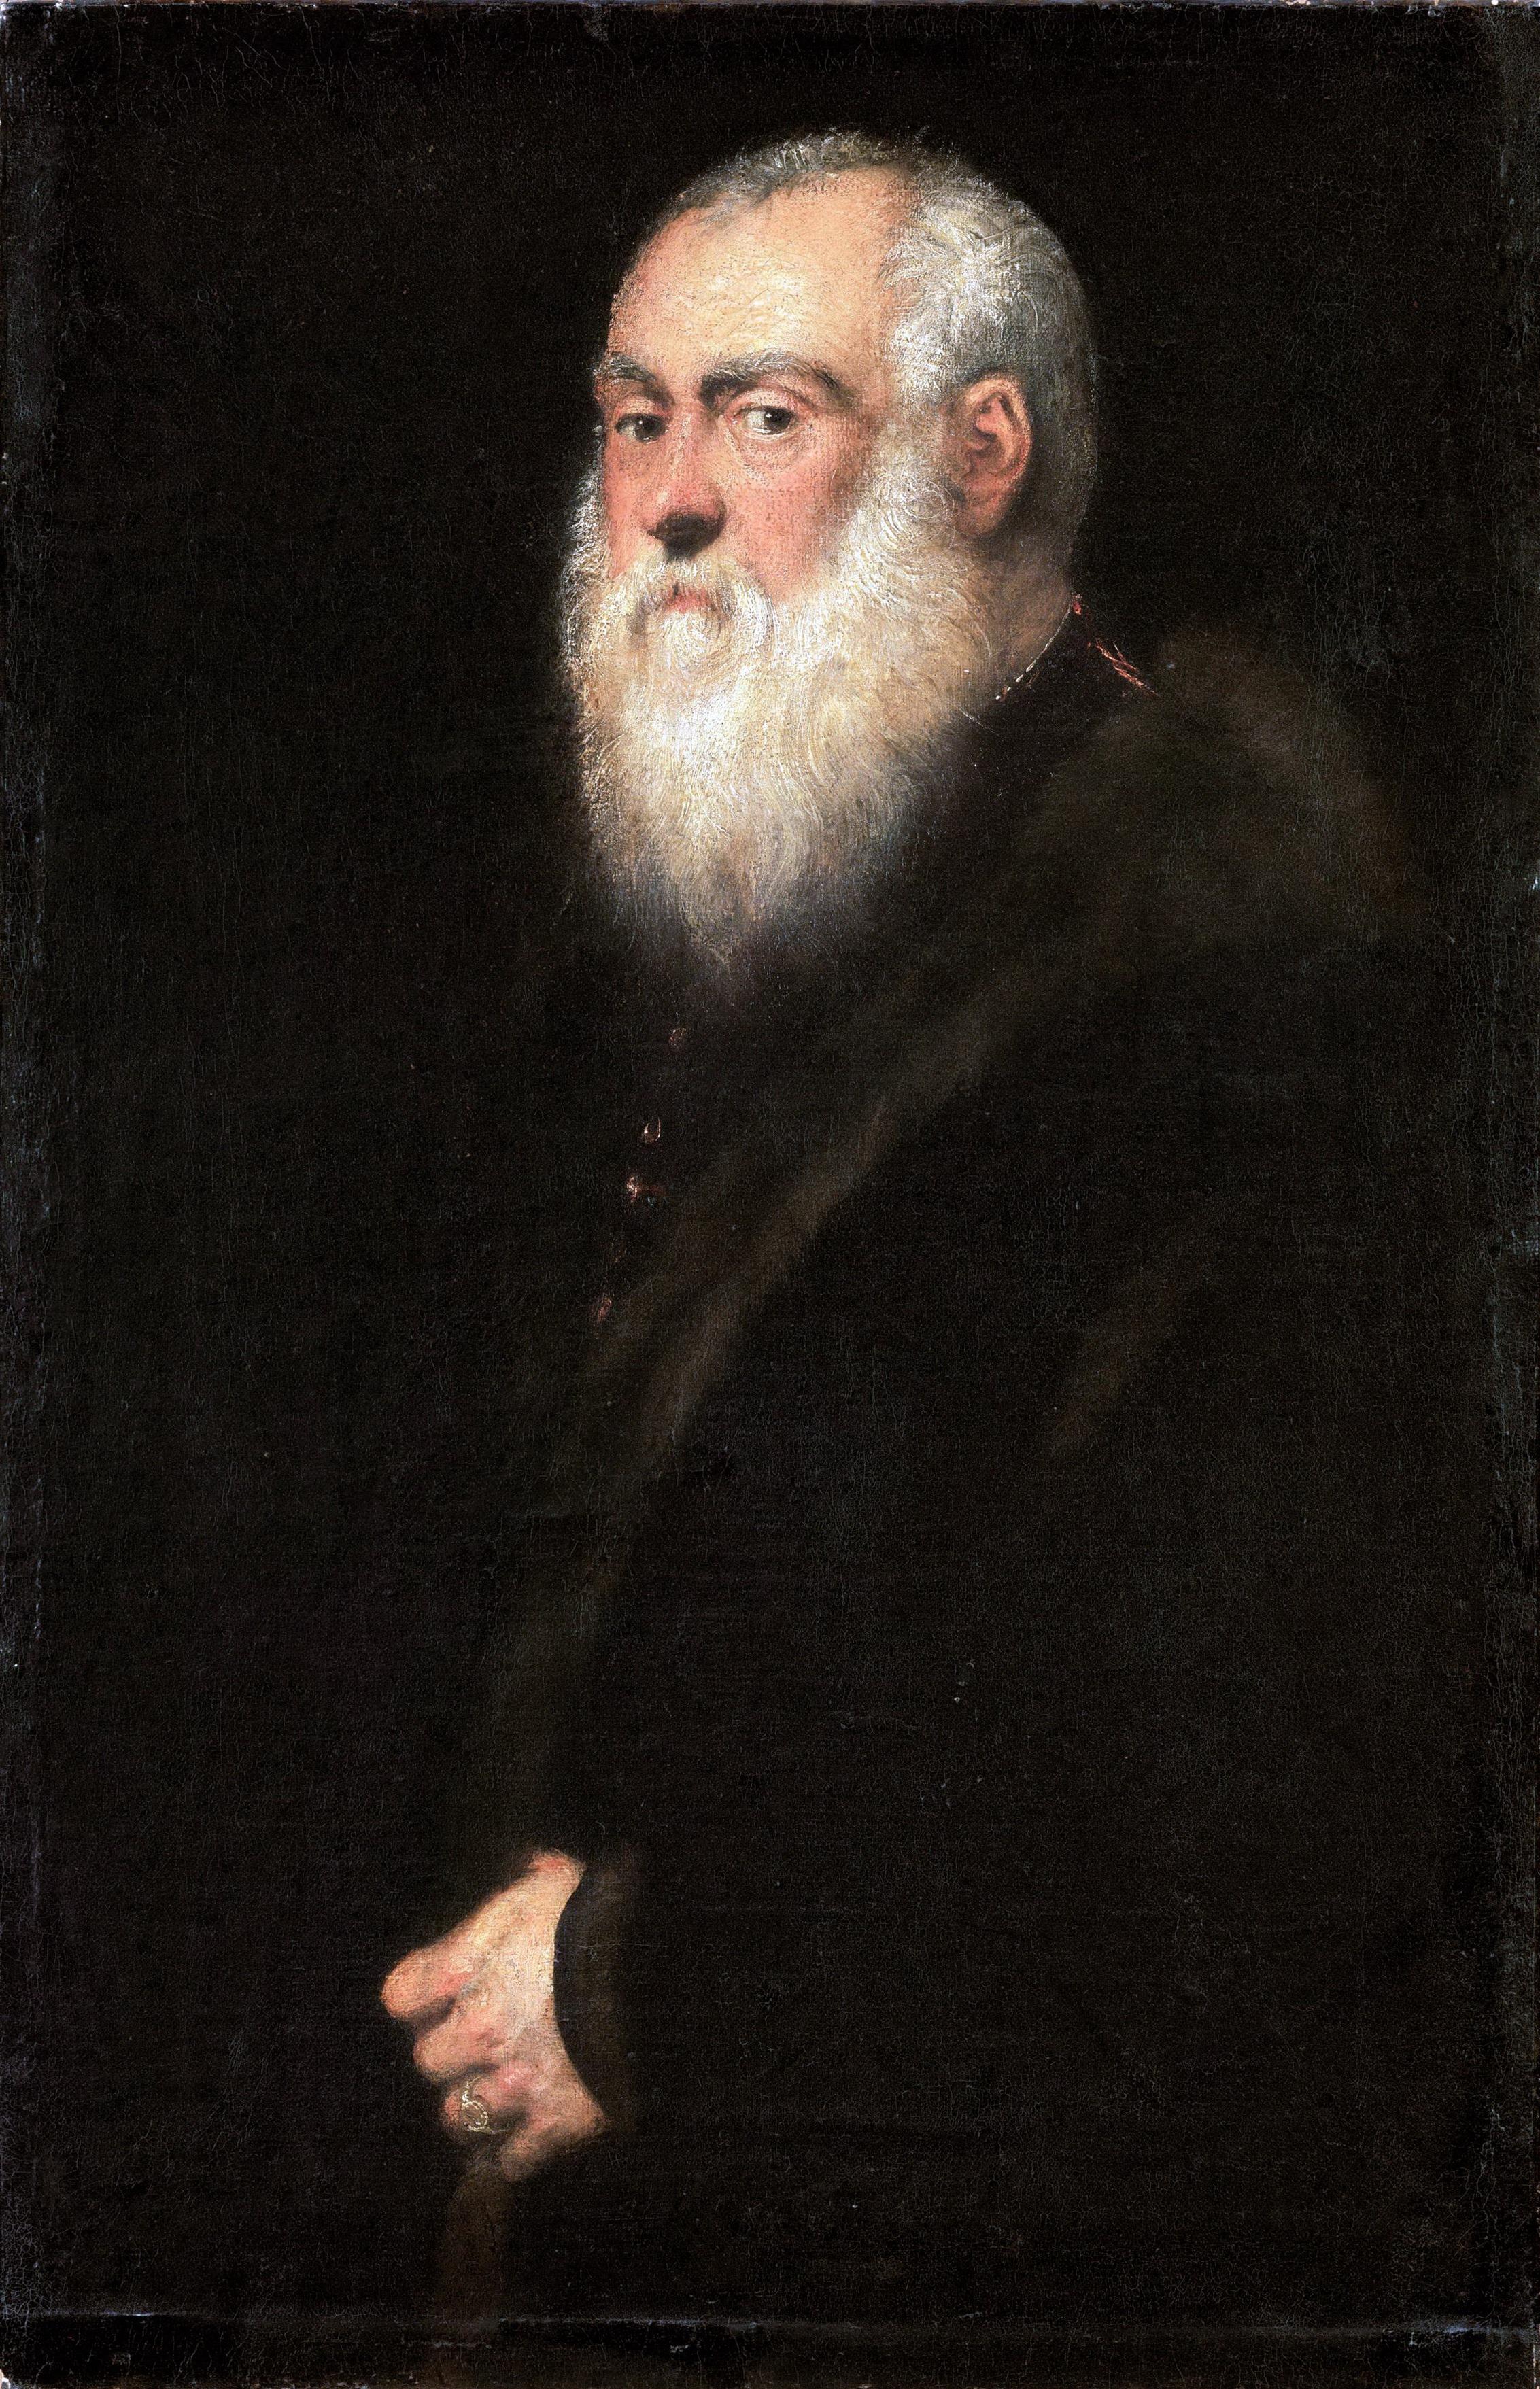 Tintoretto: Valkopartainen mies (n. 1545)